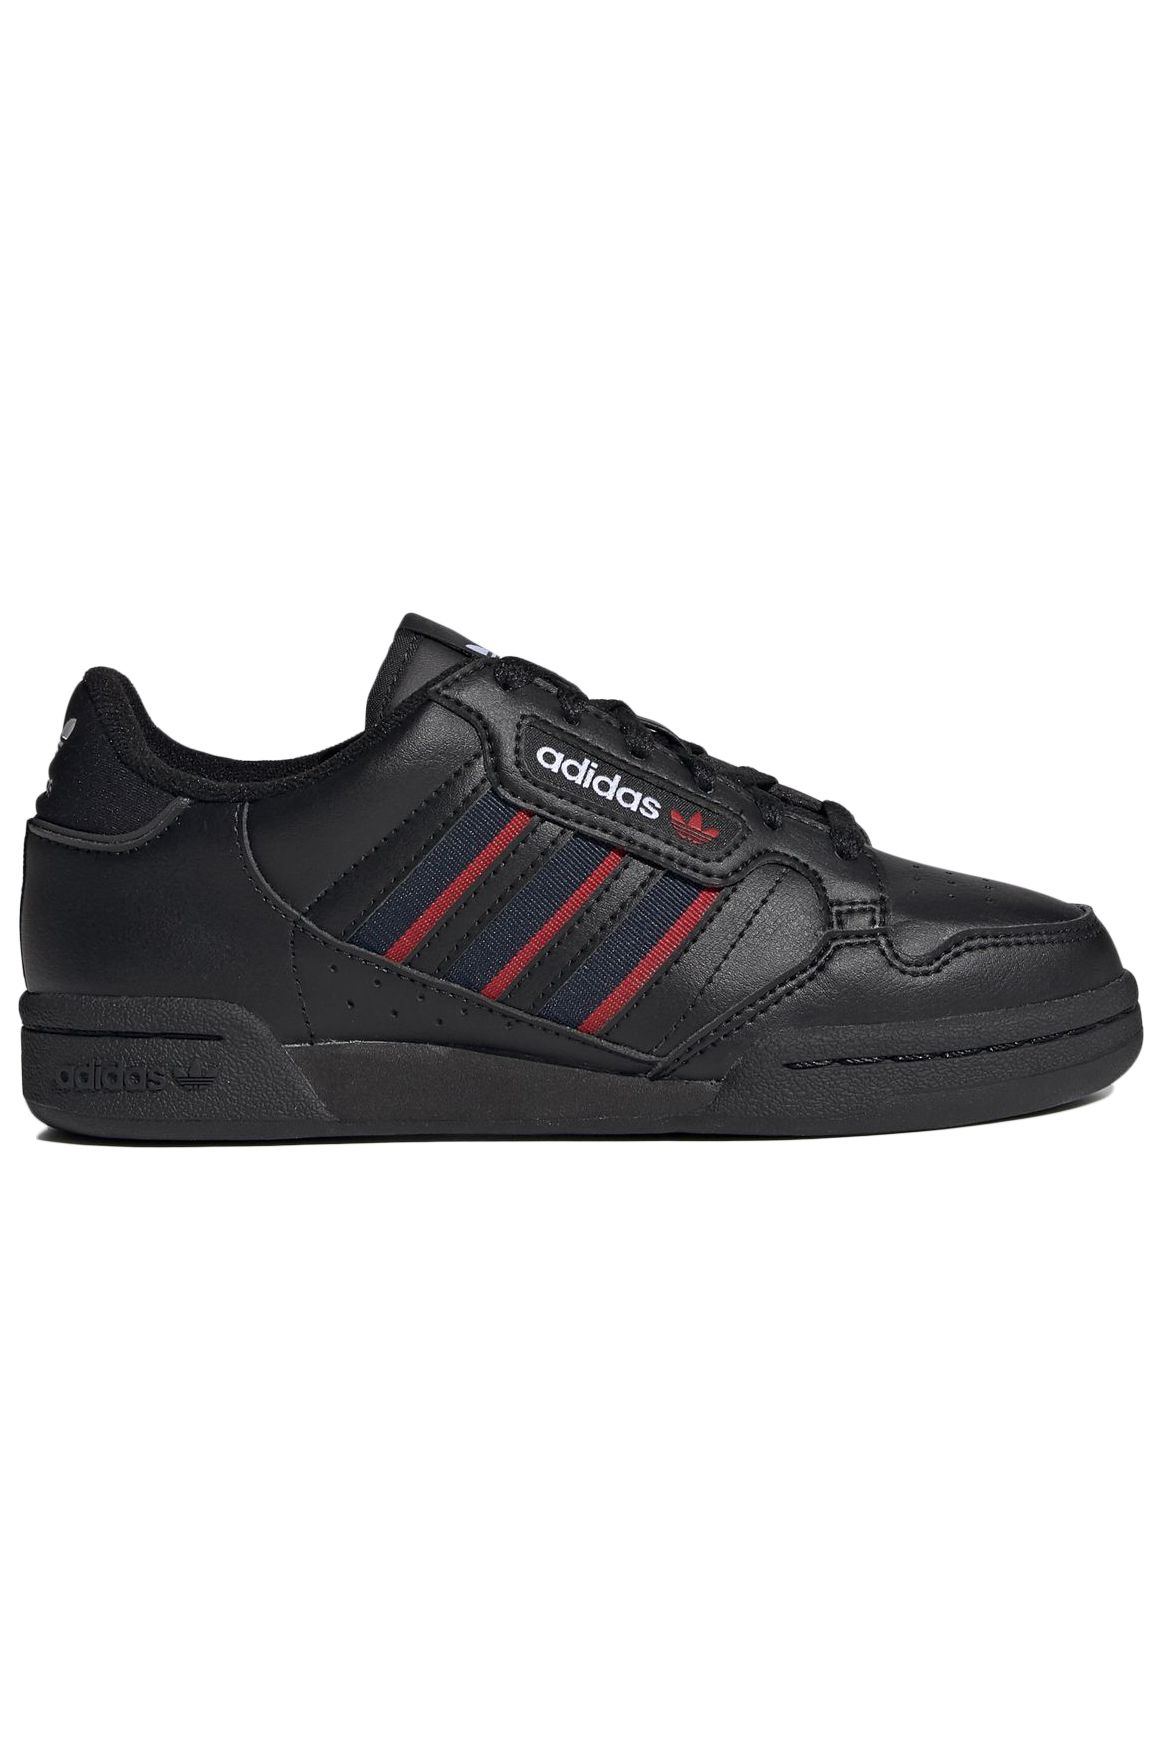 Adidas Shoes CONTINENTAL 80 STRIP Coreblack